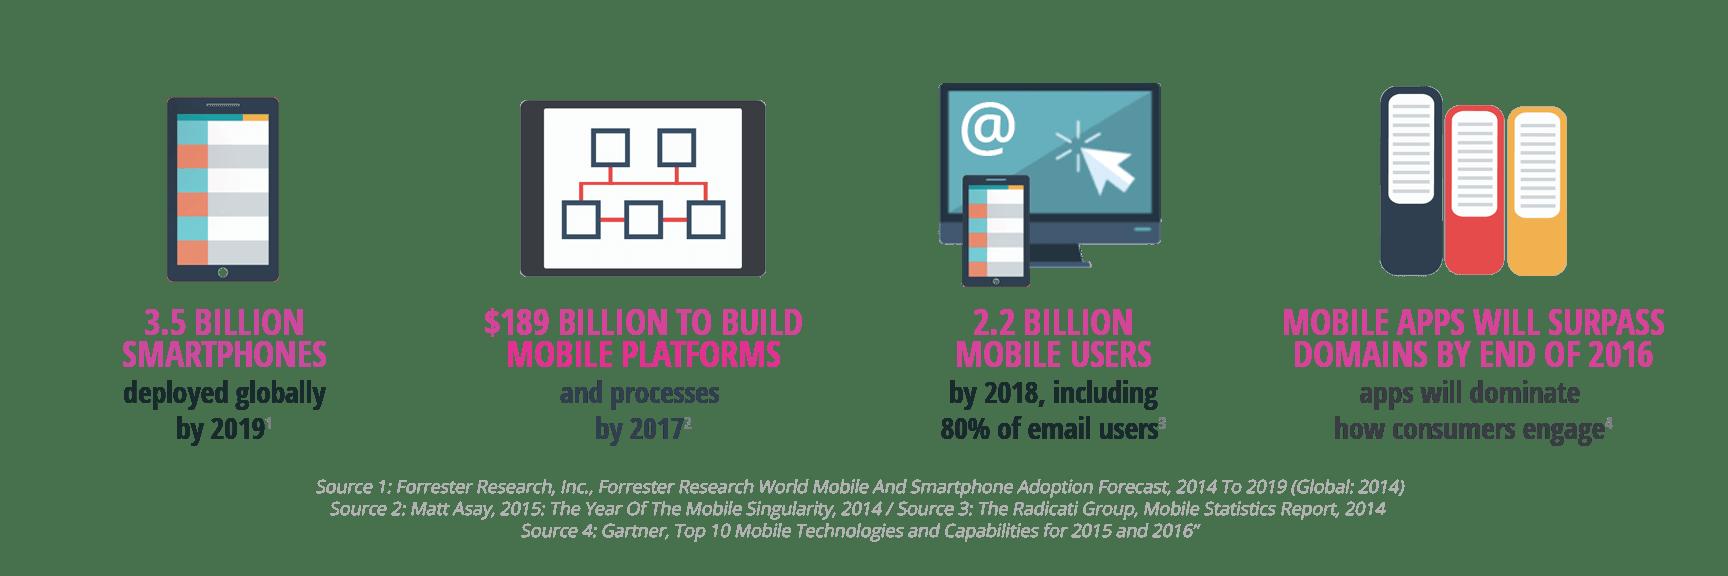 enterprise mobility statistics 2016